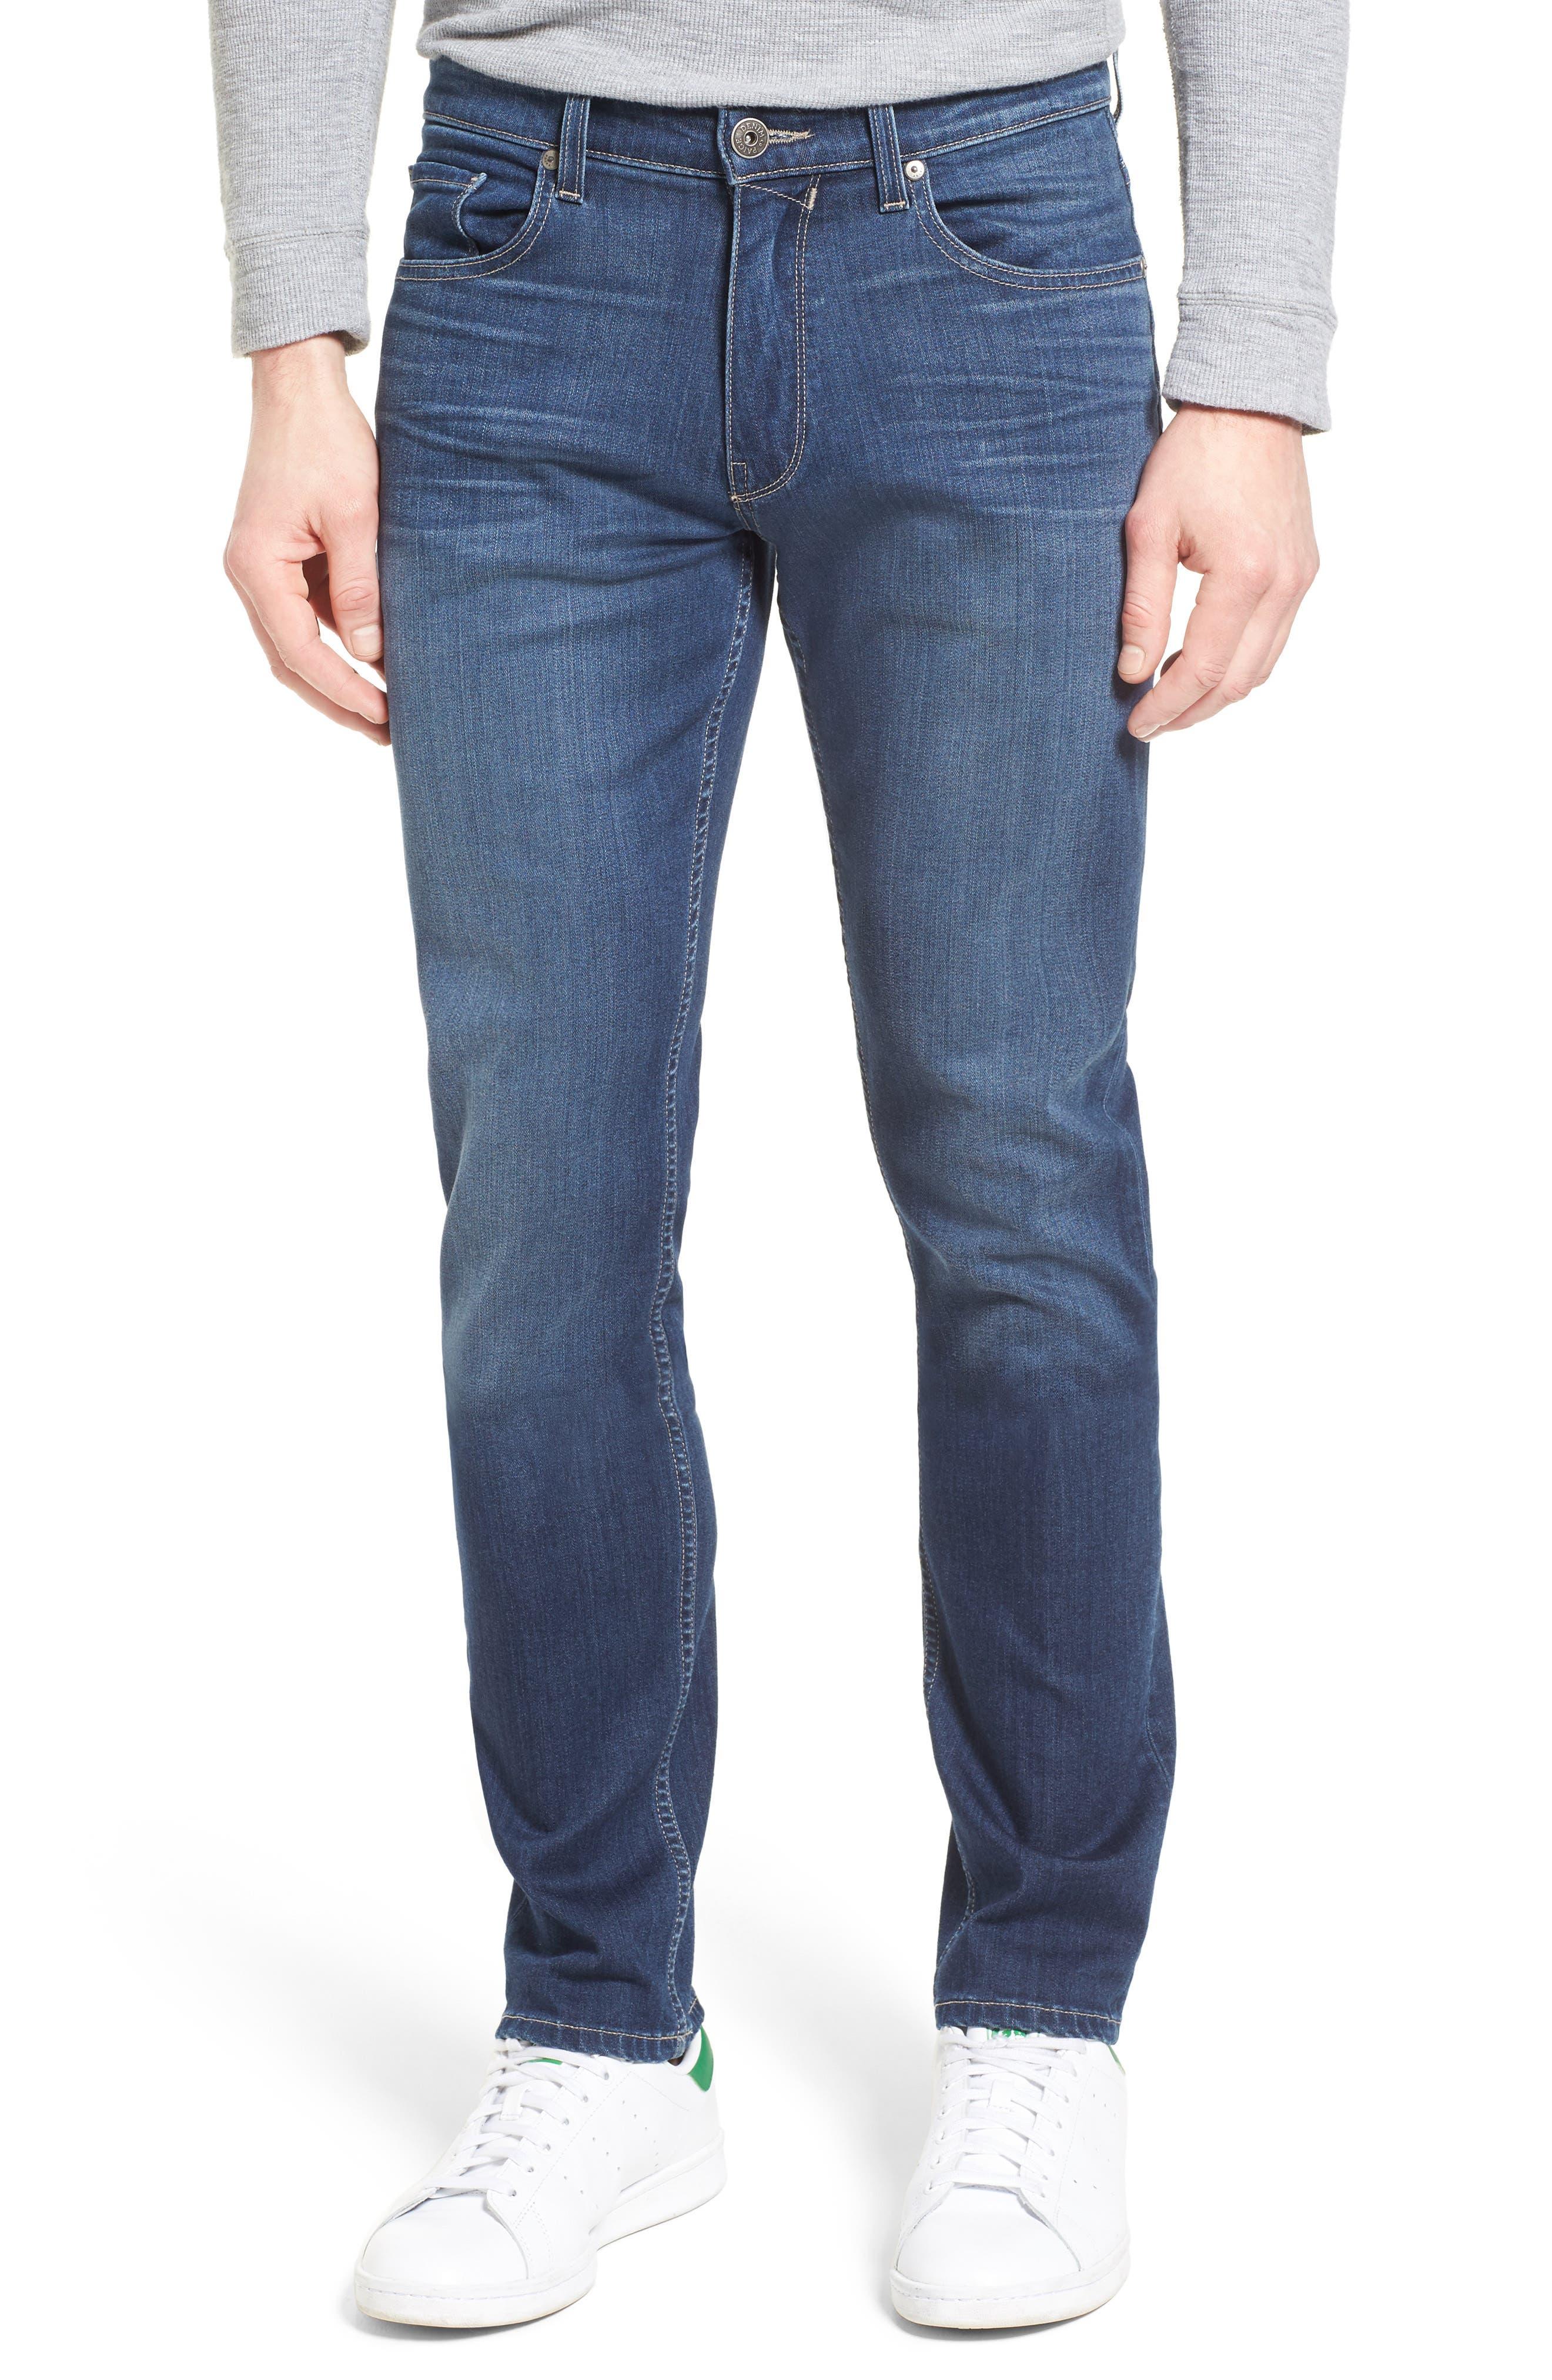 Transcend - Lennox Straight Leg Jeans,                             Main thumbnail 1, color,                             Leo